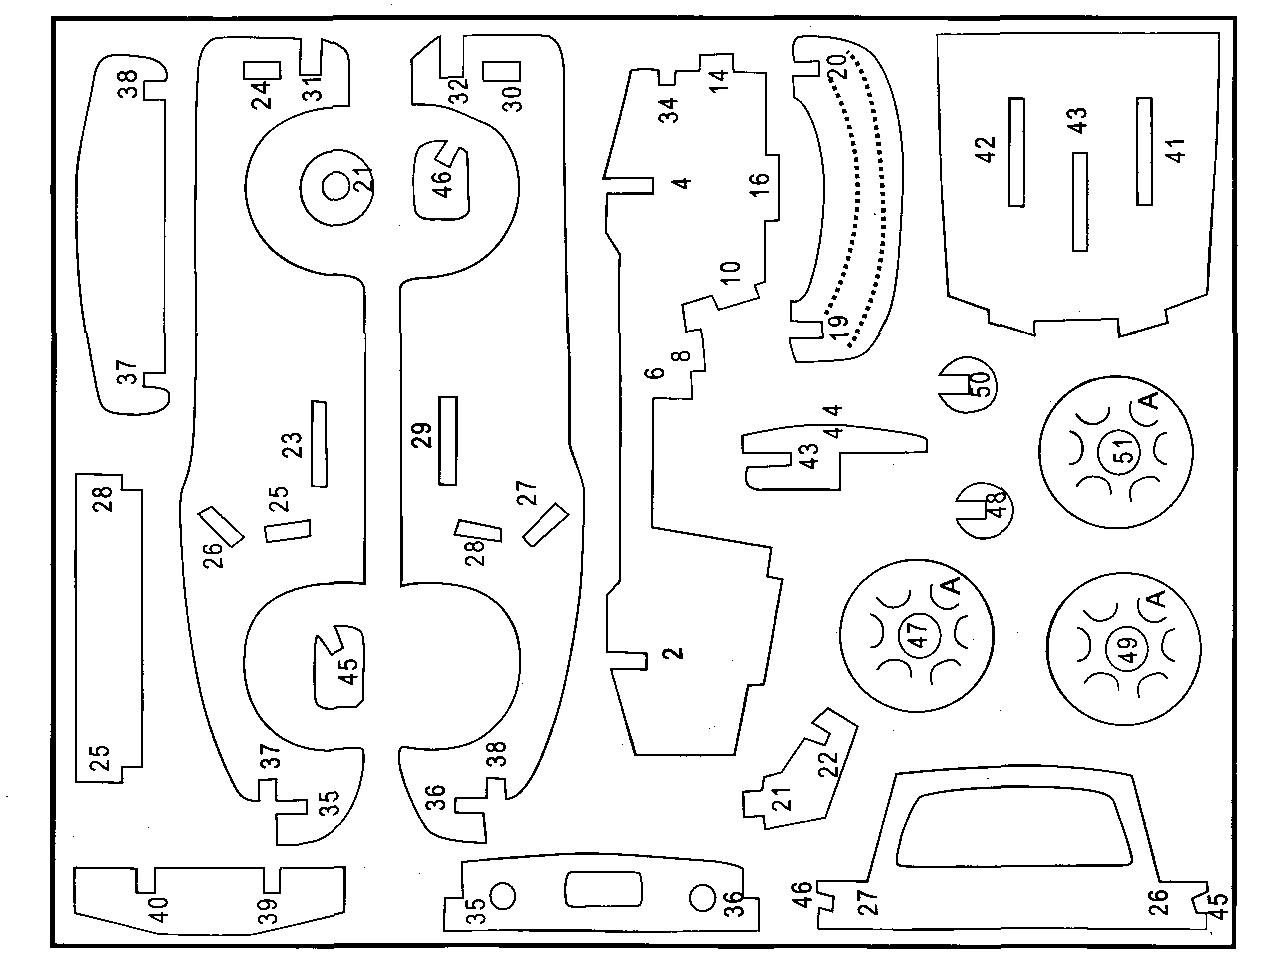 Поделки лобзиком схема